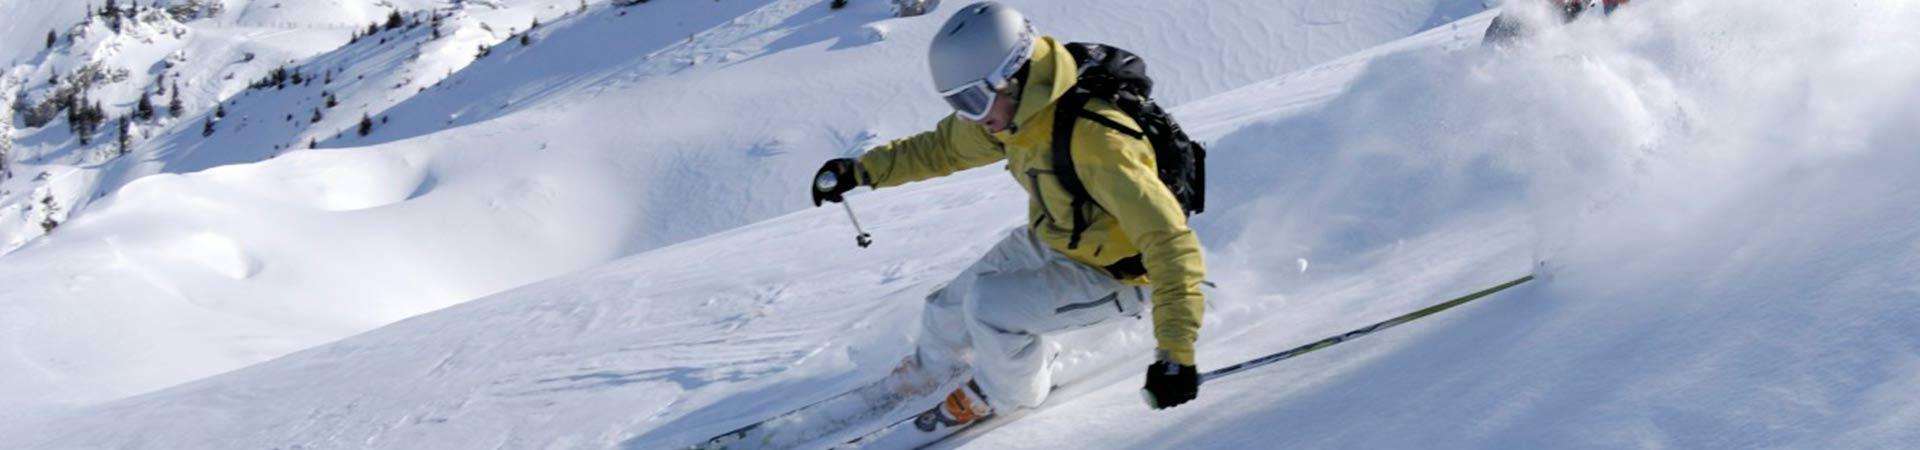 Classes-esquí-fora-pista-Free-Ride-4h